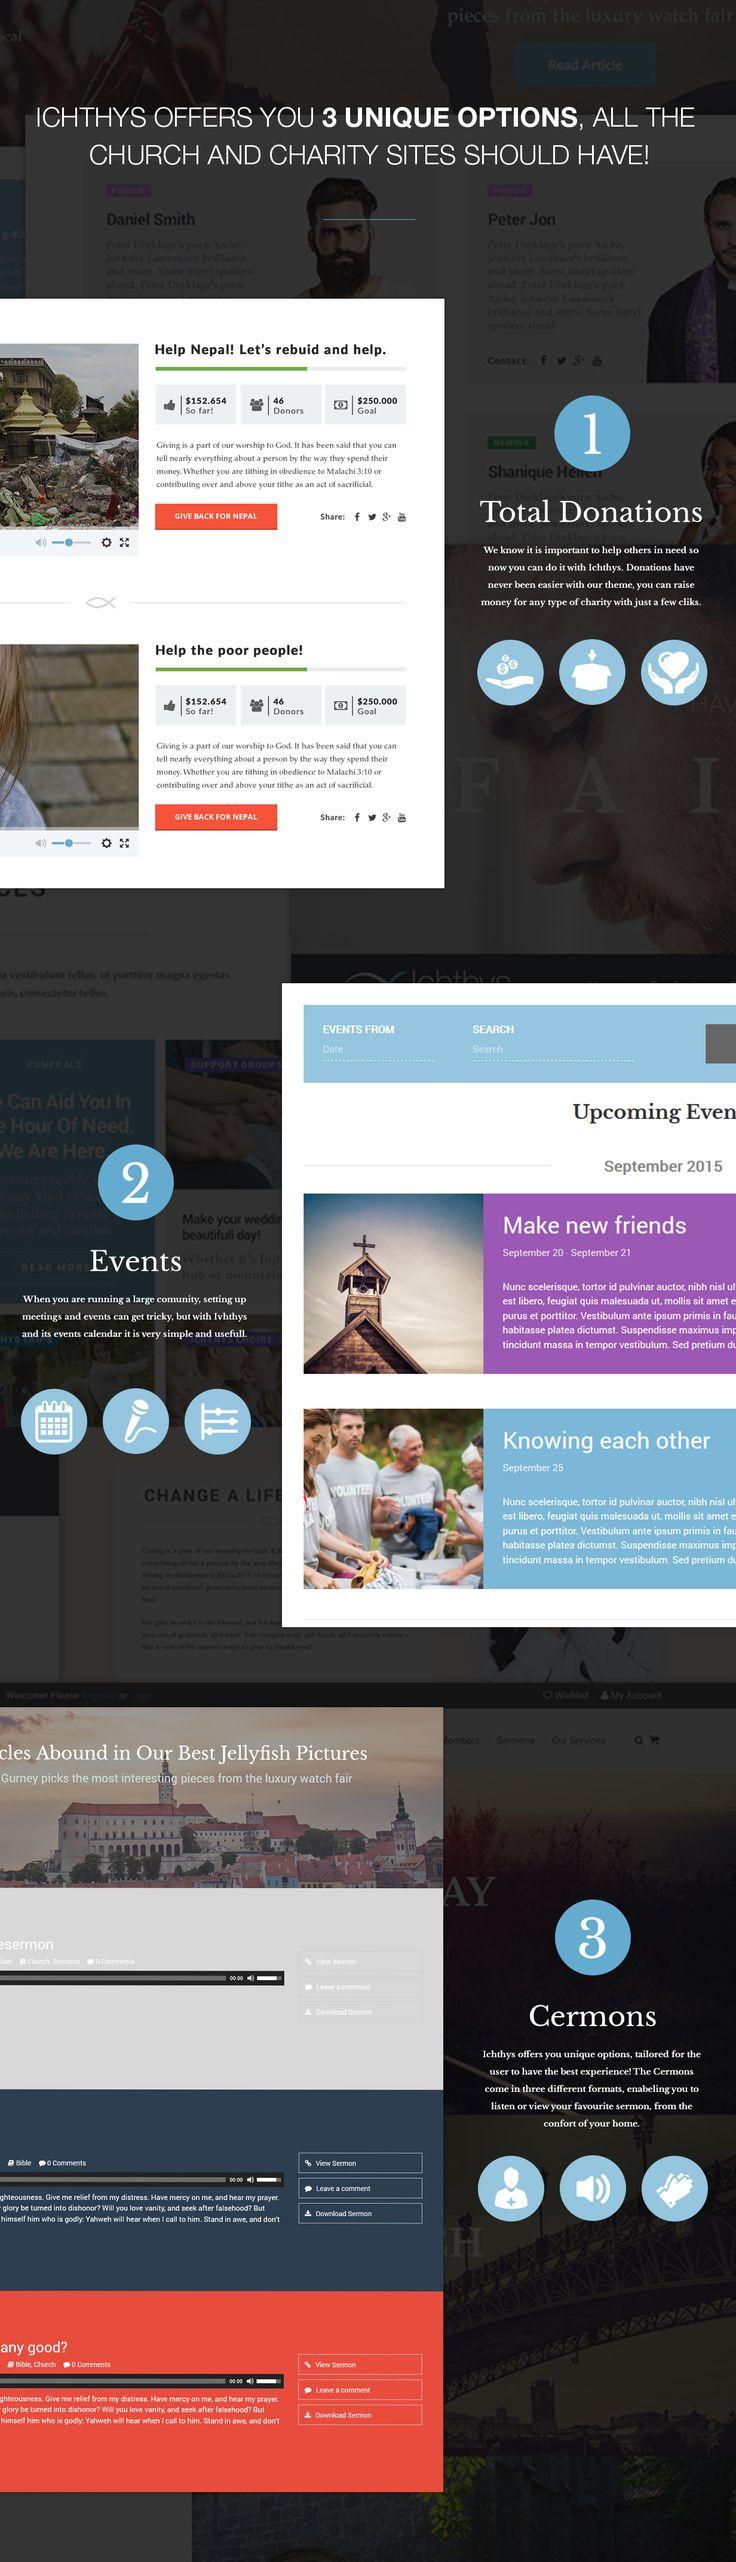 Ichthys - Church / Events / Religion / Donation / Nonprofit / Sermon / Charity WordPress Theme by modeltheme